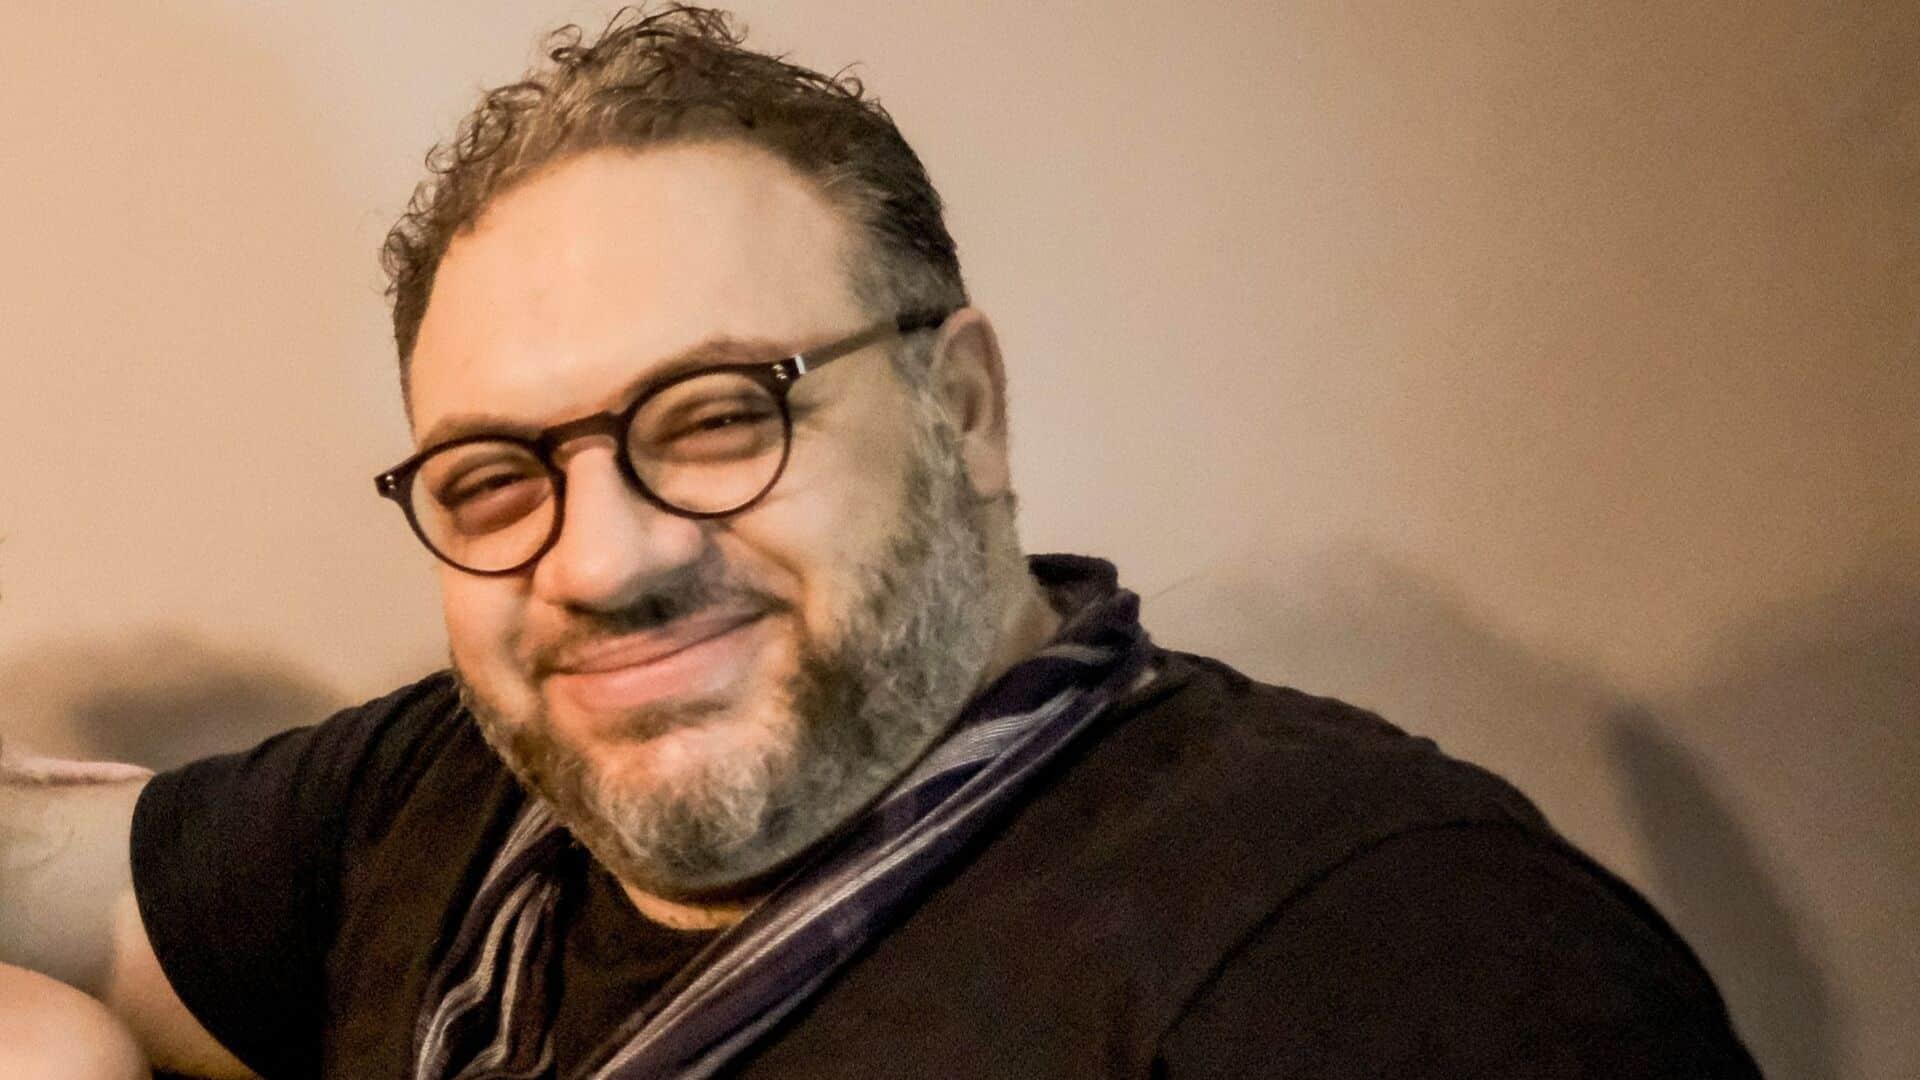 salumi italiani: Vincenzo Mancino